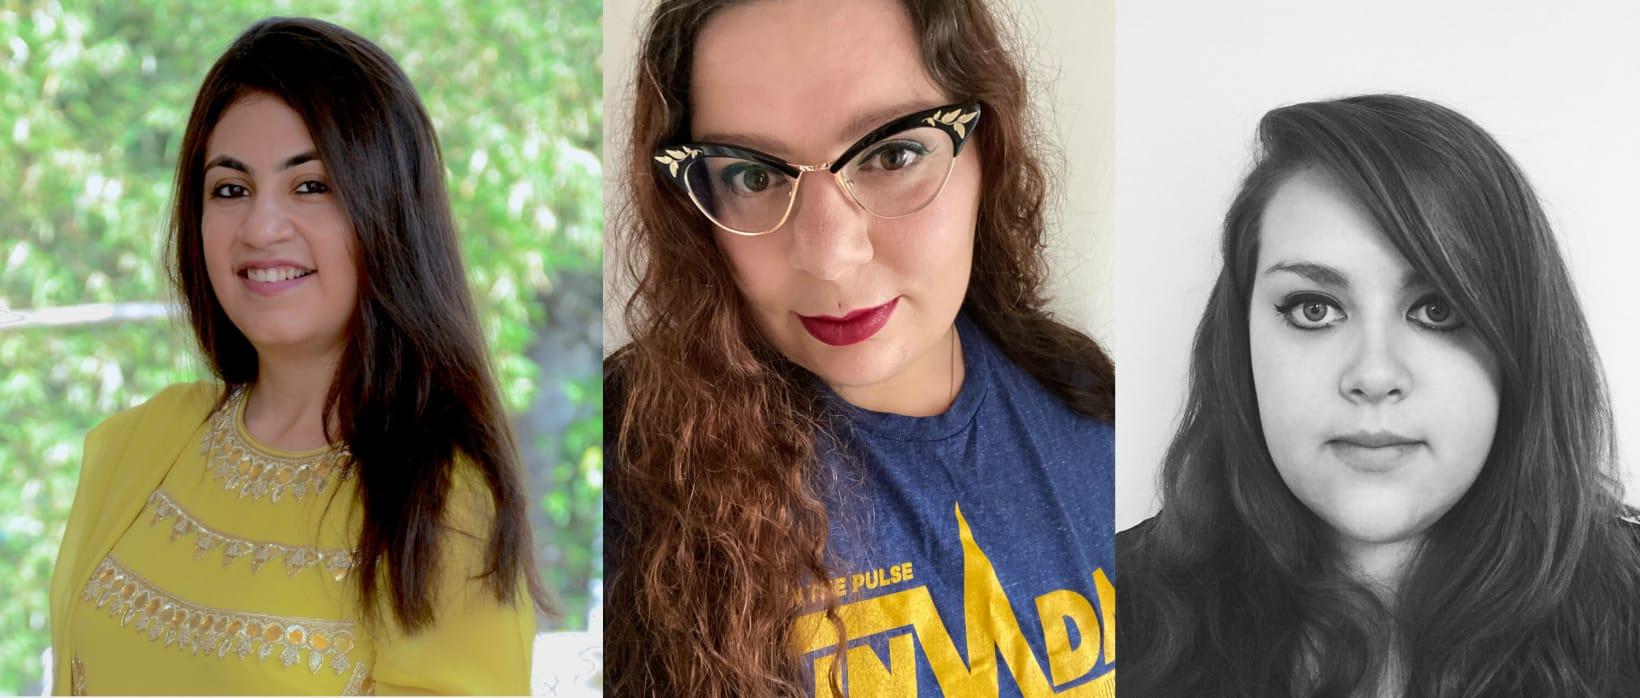 Sheeba Sehgal, Lucy Beth Brawn and Jade Turner